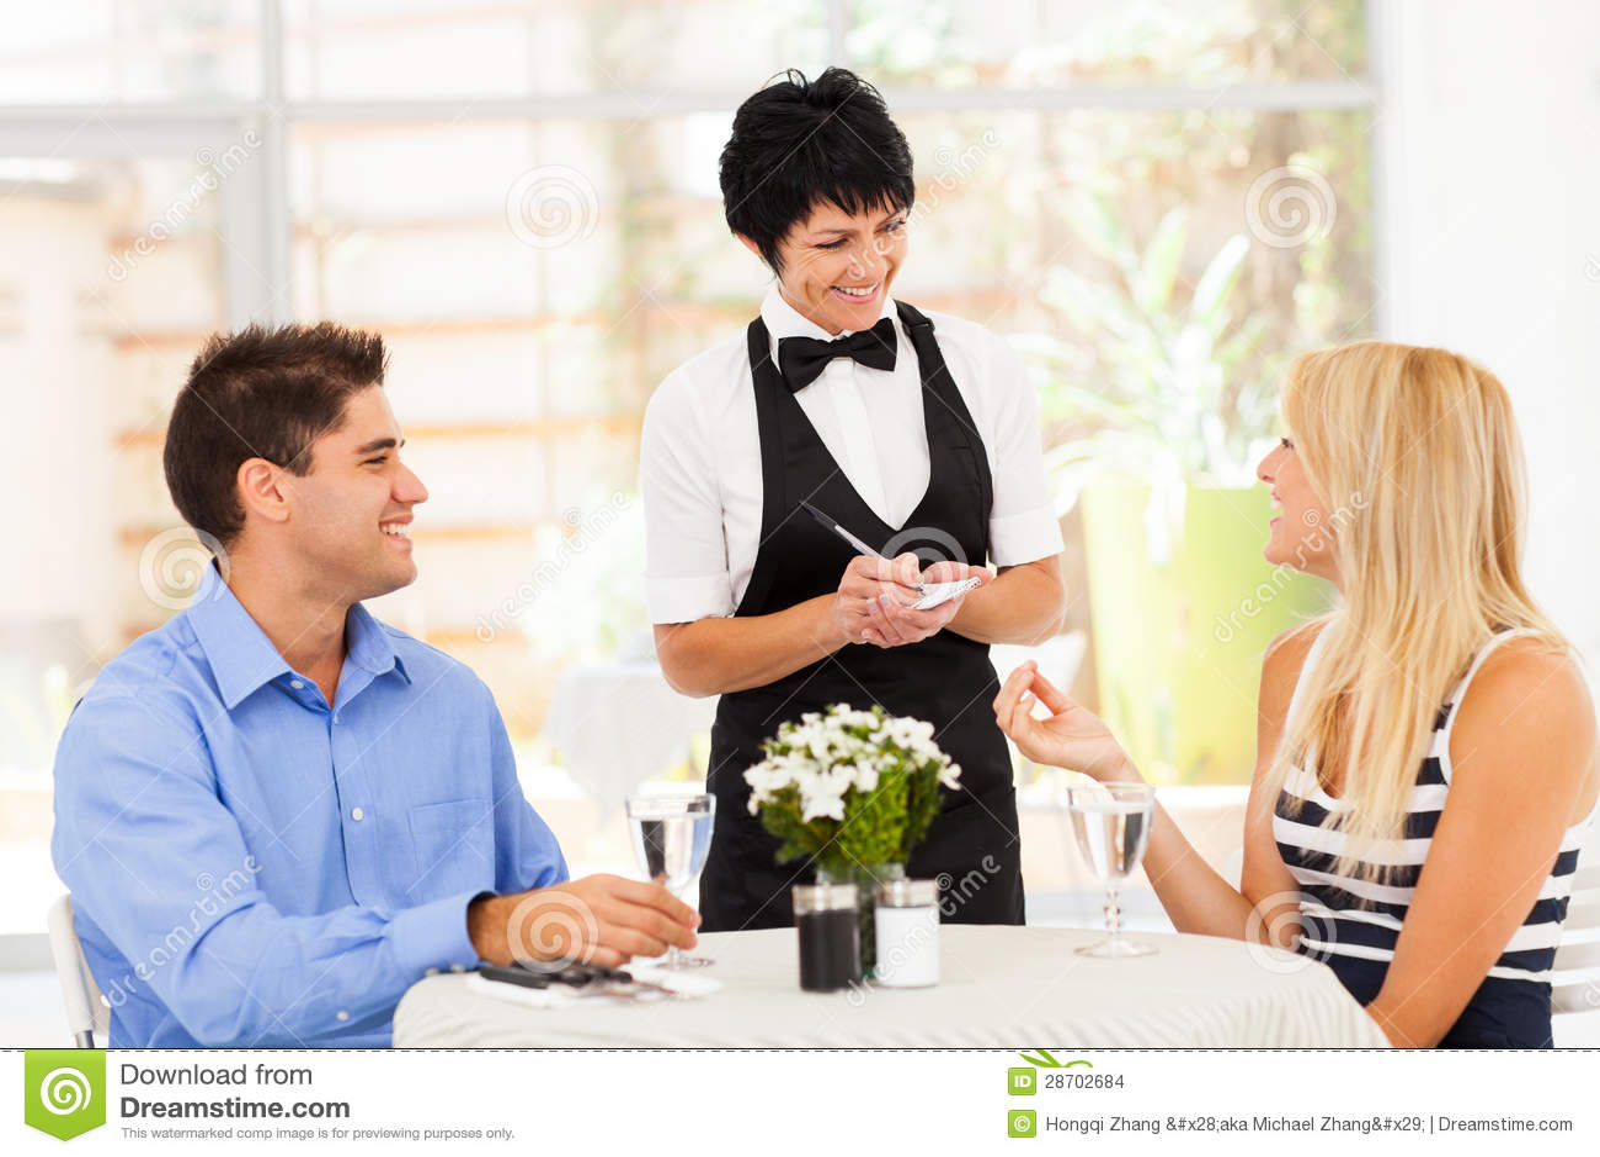 Waitress taking order  Waiter Taking Order